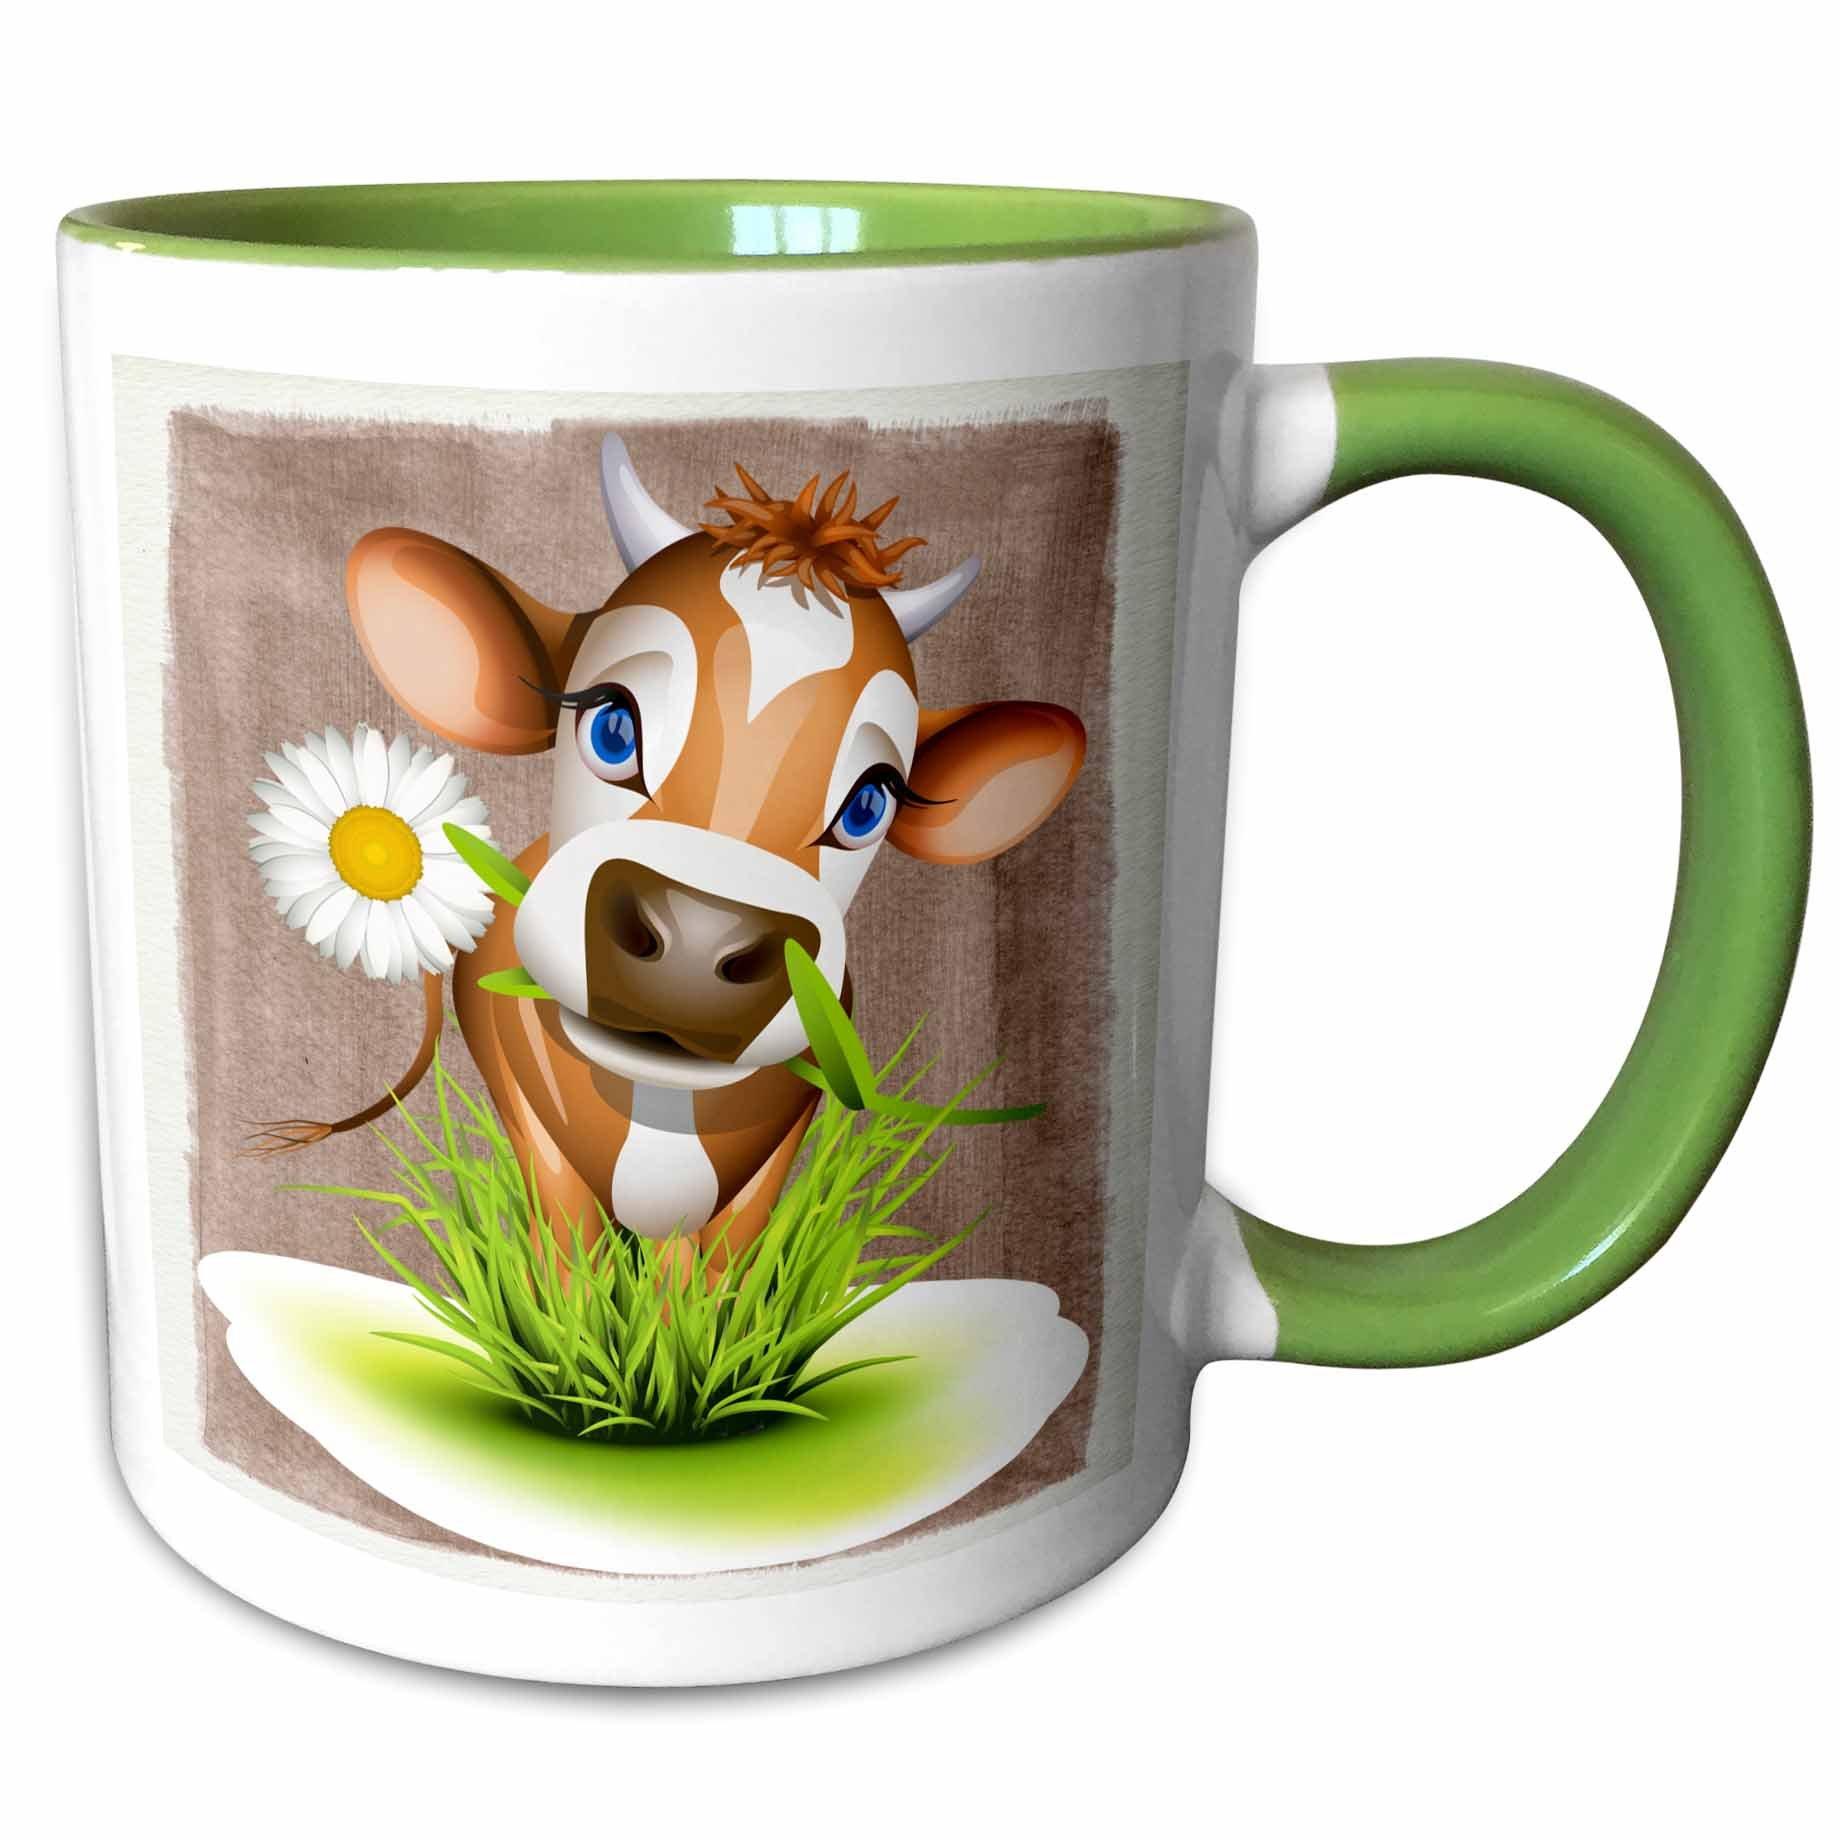 3dRose 110913_7 Mug, 11oz, Green/White